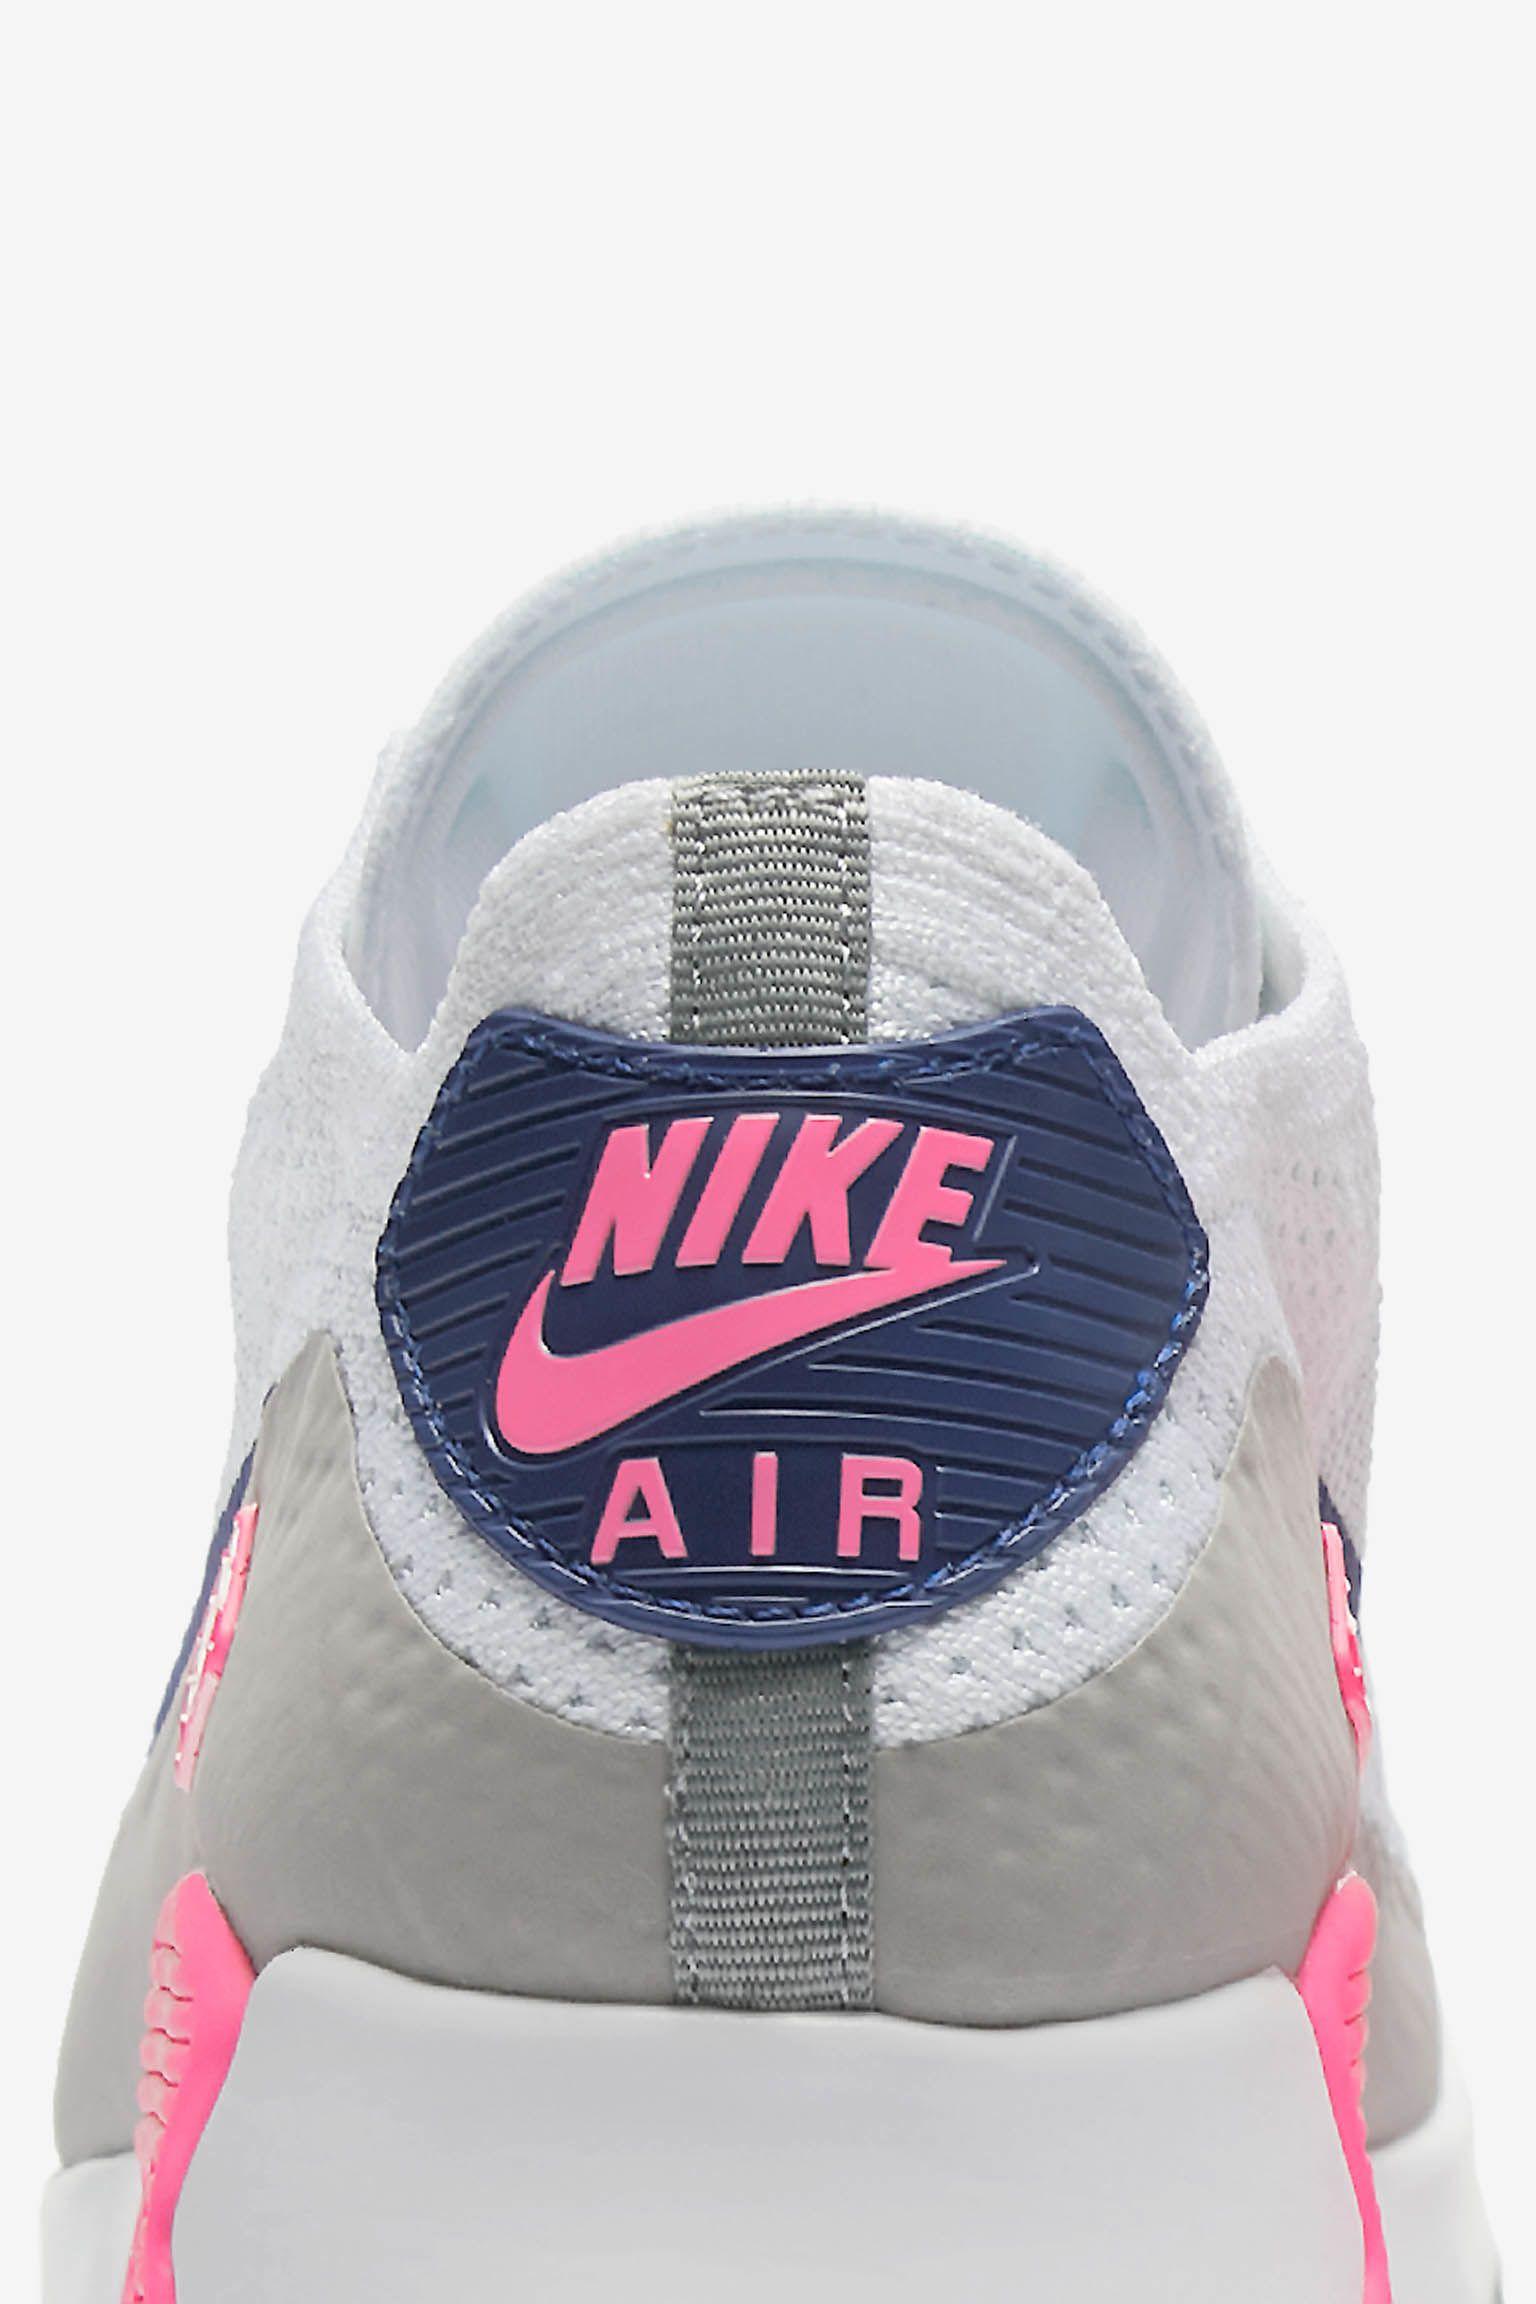 Women's Nike Air Max 90 Ultra 2.0 Flyknit 'White & Laser Pink ...